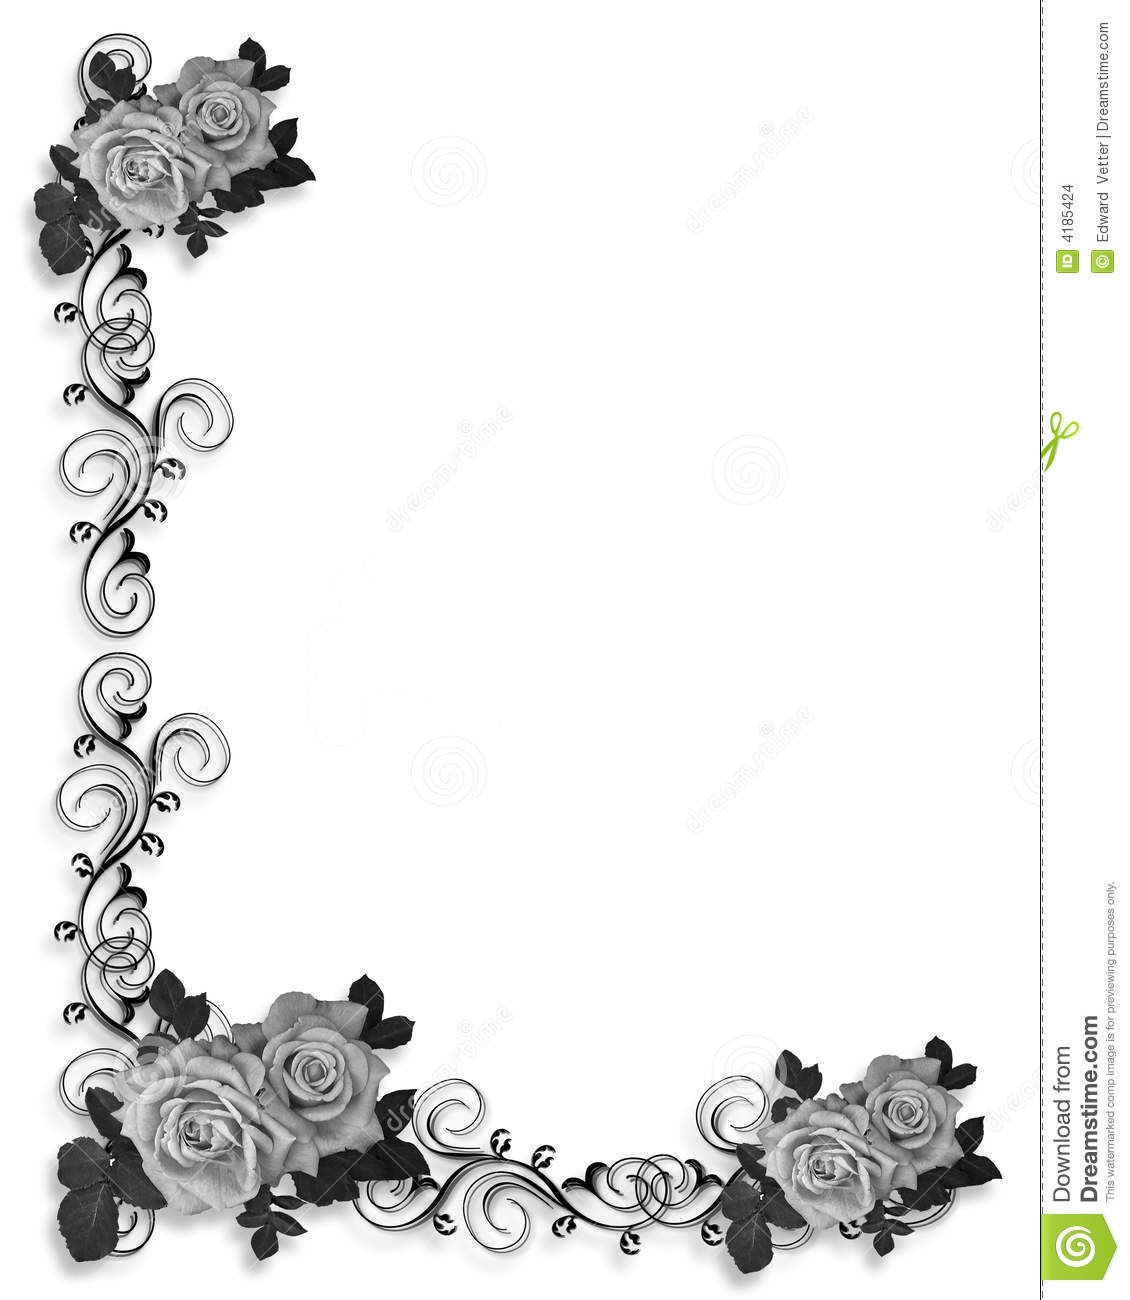 14 Black And White Border Designs Images Black And White Border